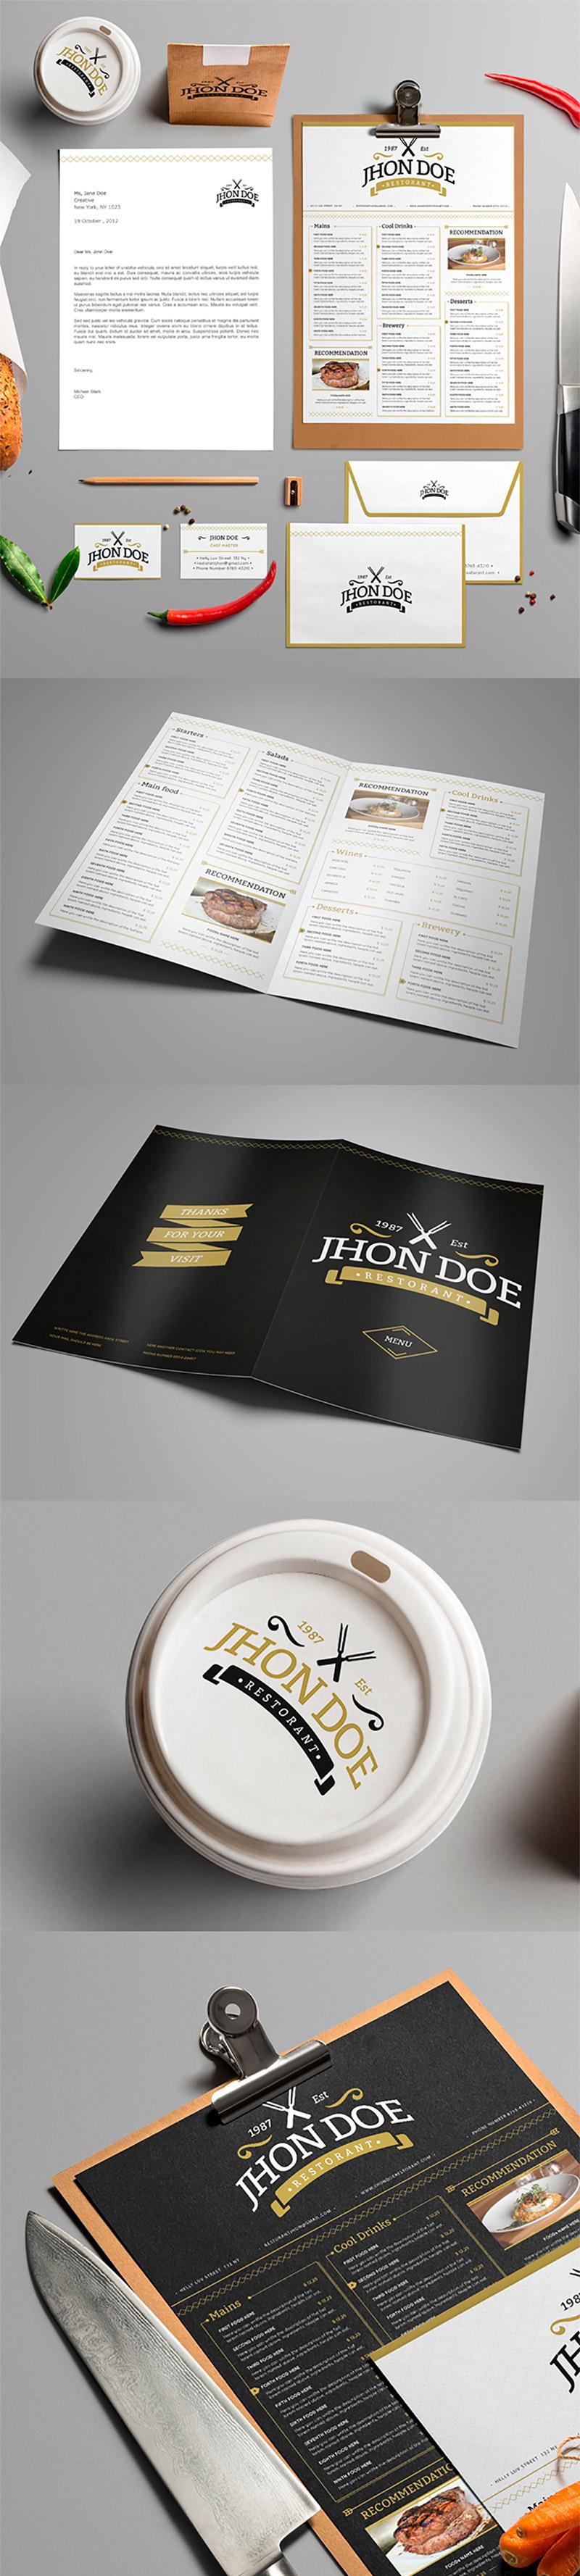 elegant brand identity pack graphicsfuel. Black Bedroom Furniture Sets. Home Design Ideas